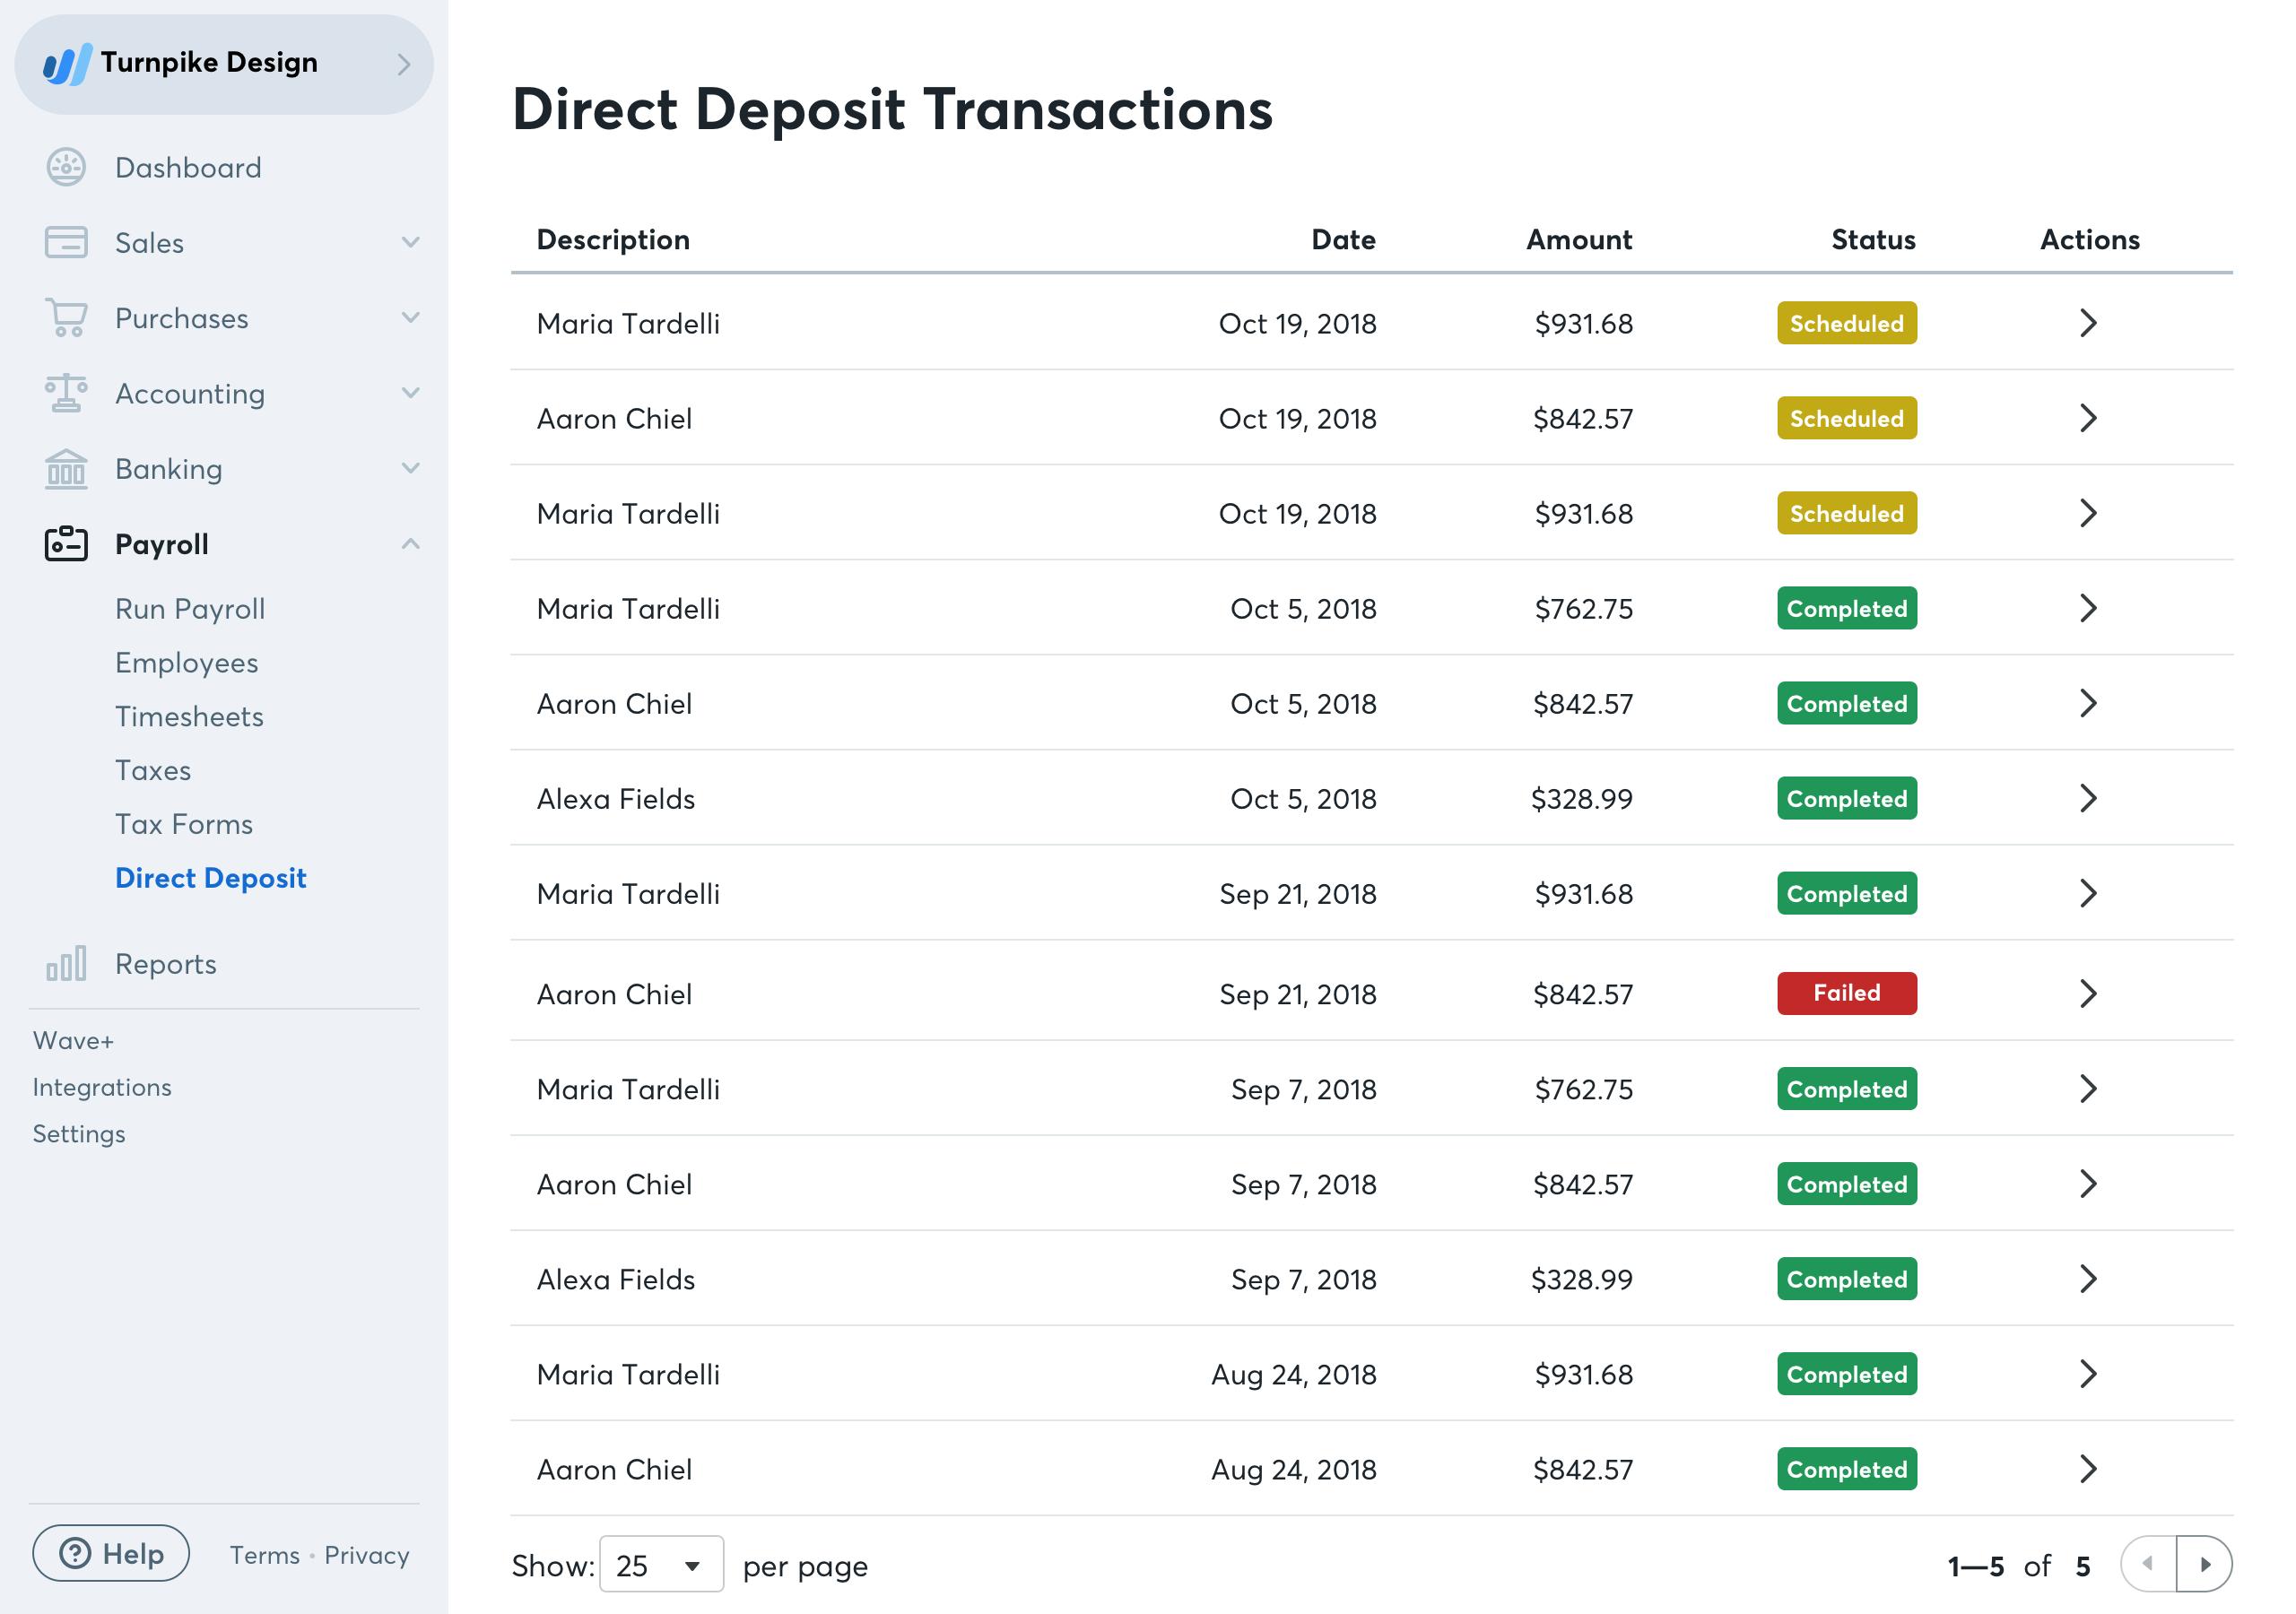 Direct Deposit Transactions